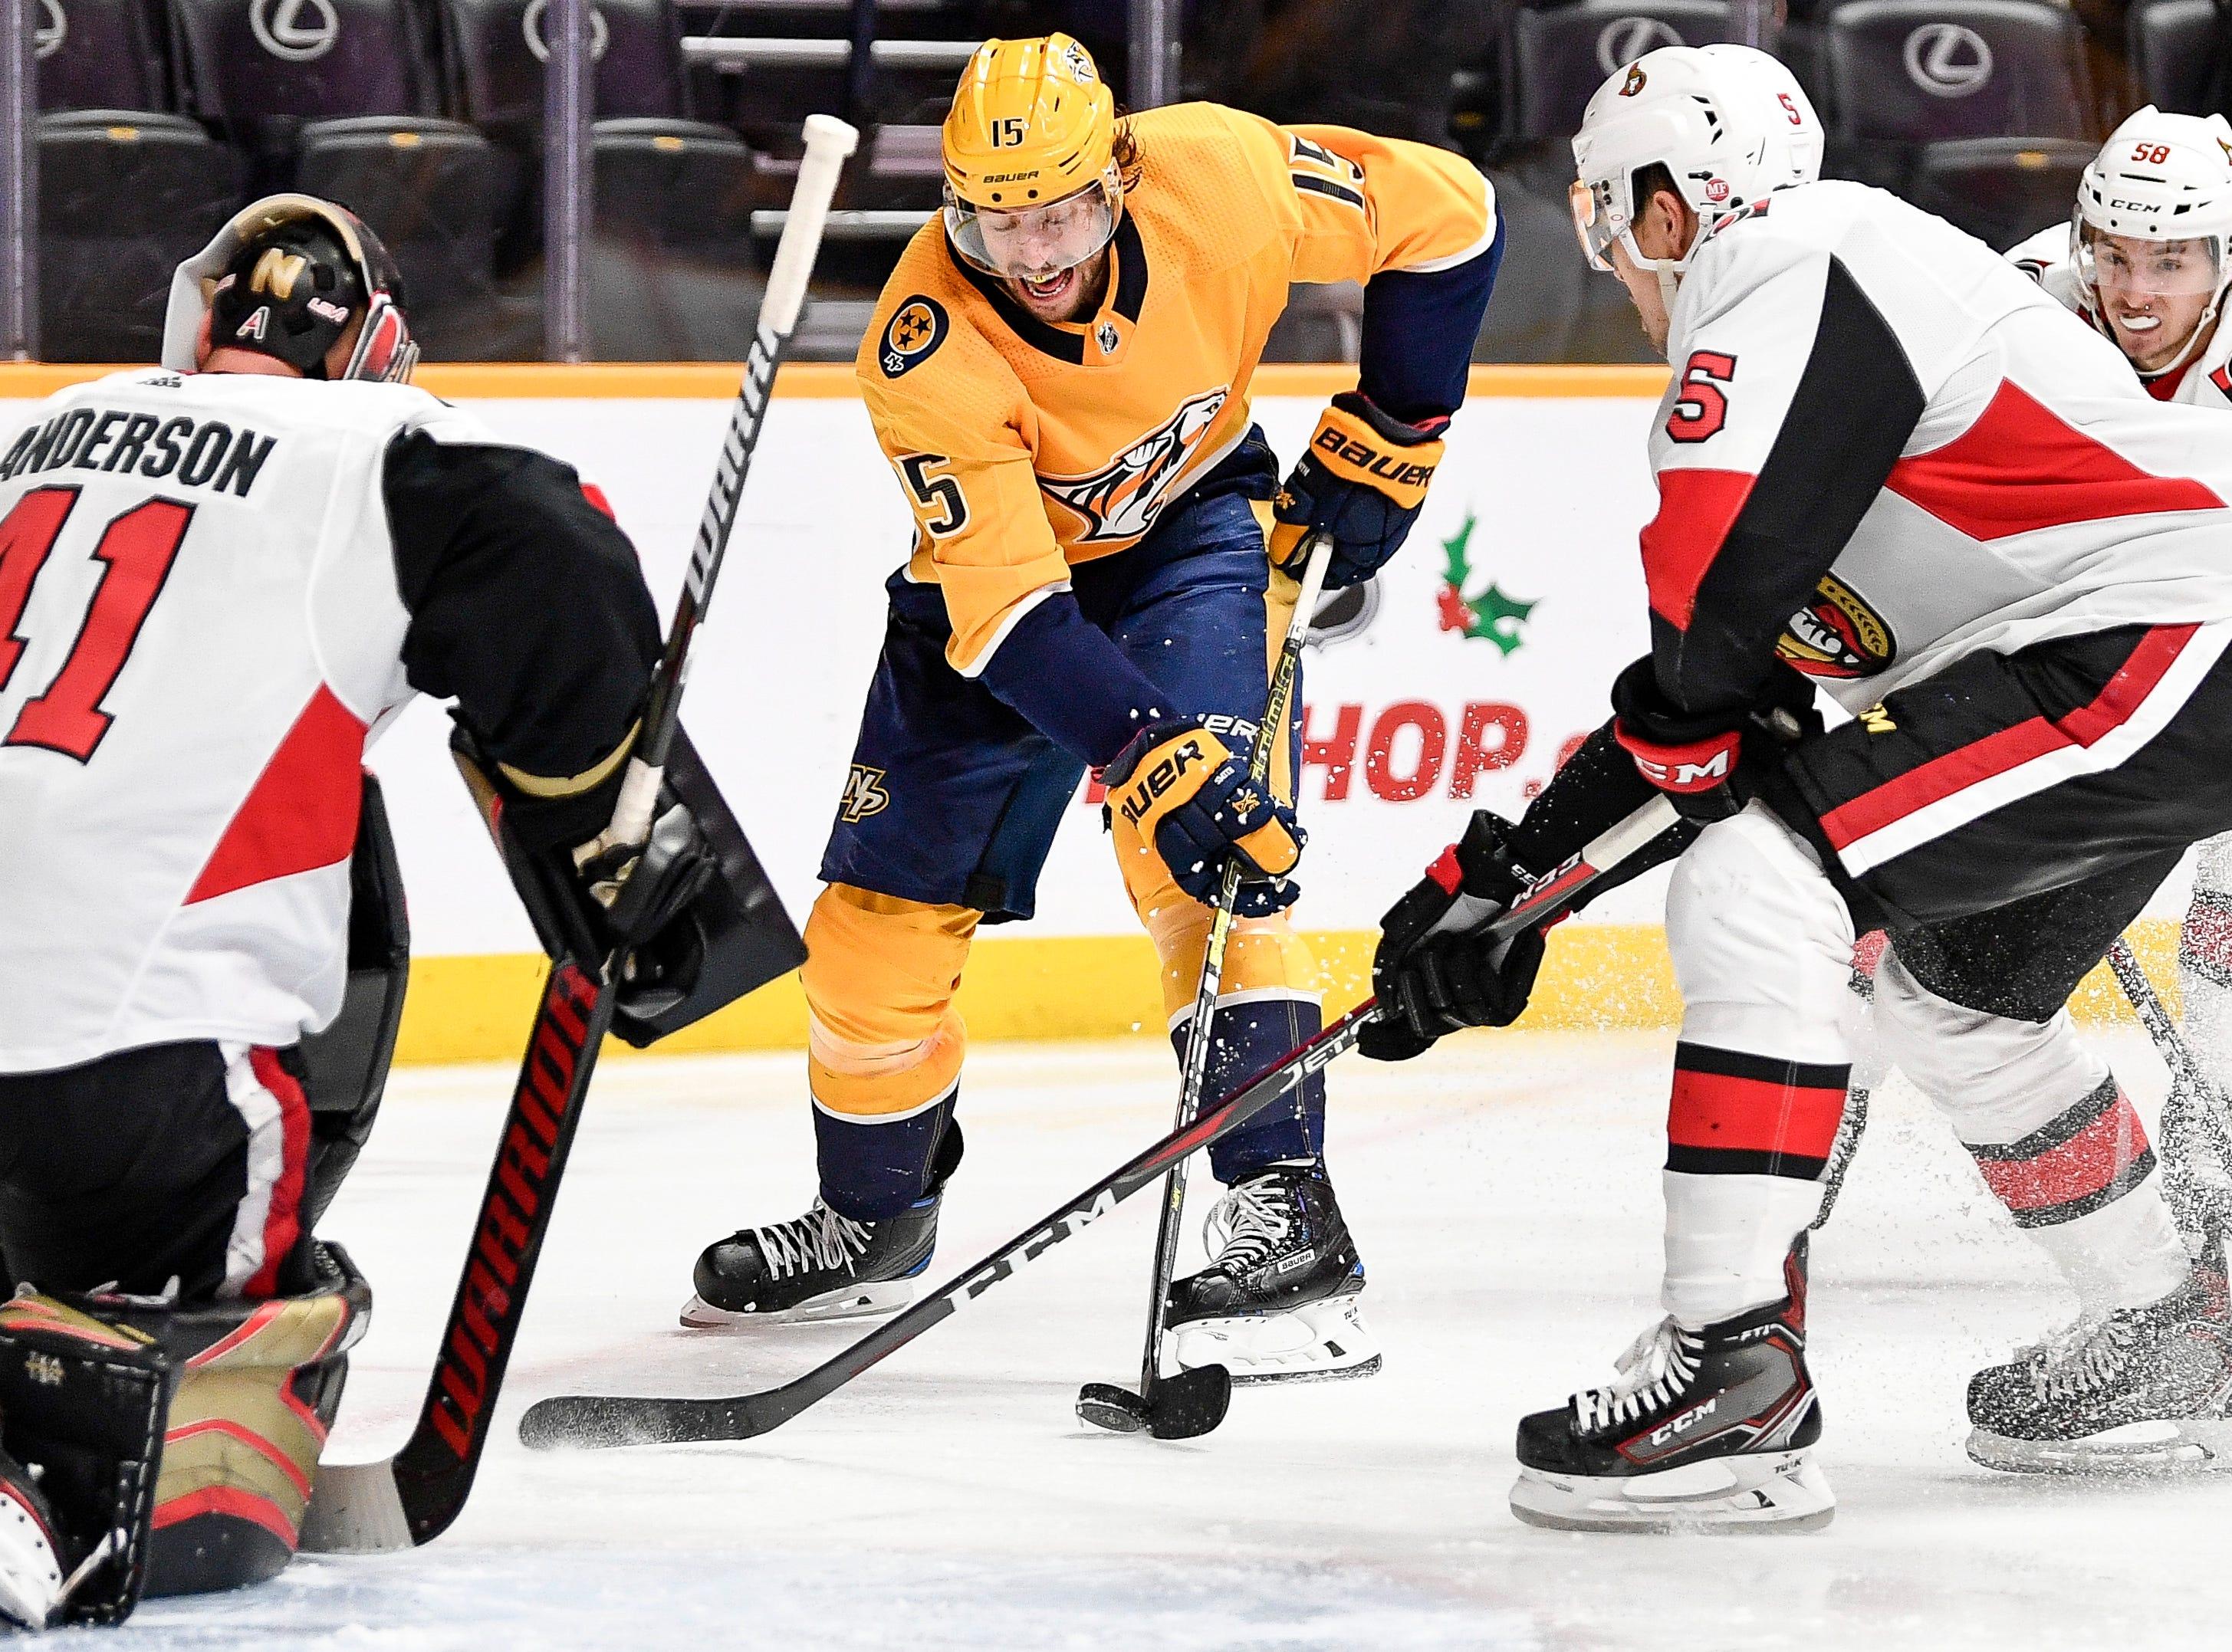 Nashville Predators right wing Craig Smith (15) moves in to score a goal against Ottawa Senators goaltender Craig Anderson (41) during the third period at Bridgestone Arena in Nashville, Tenn., Tuesday, Dec. 11, 2018.